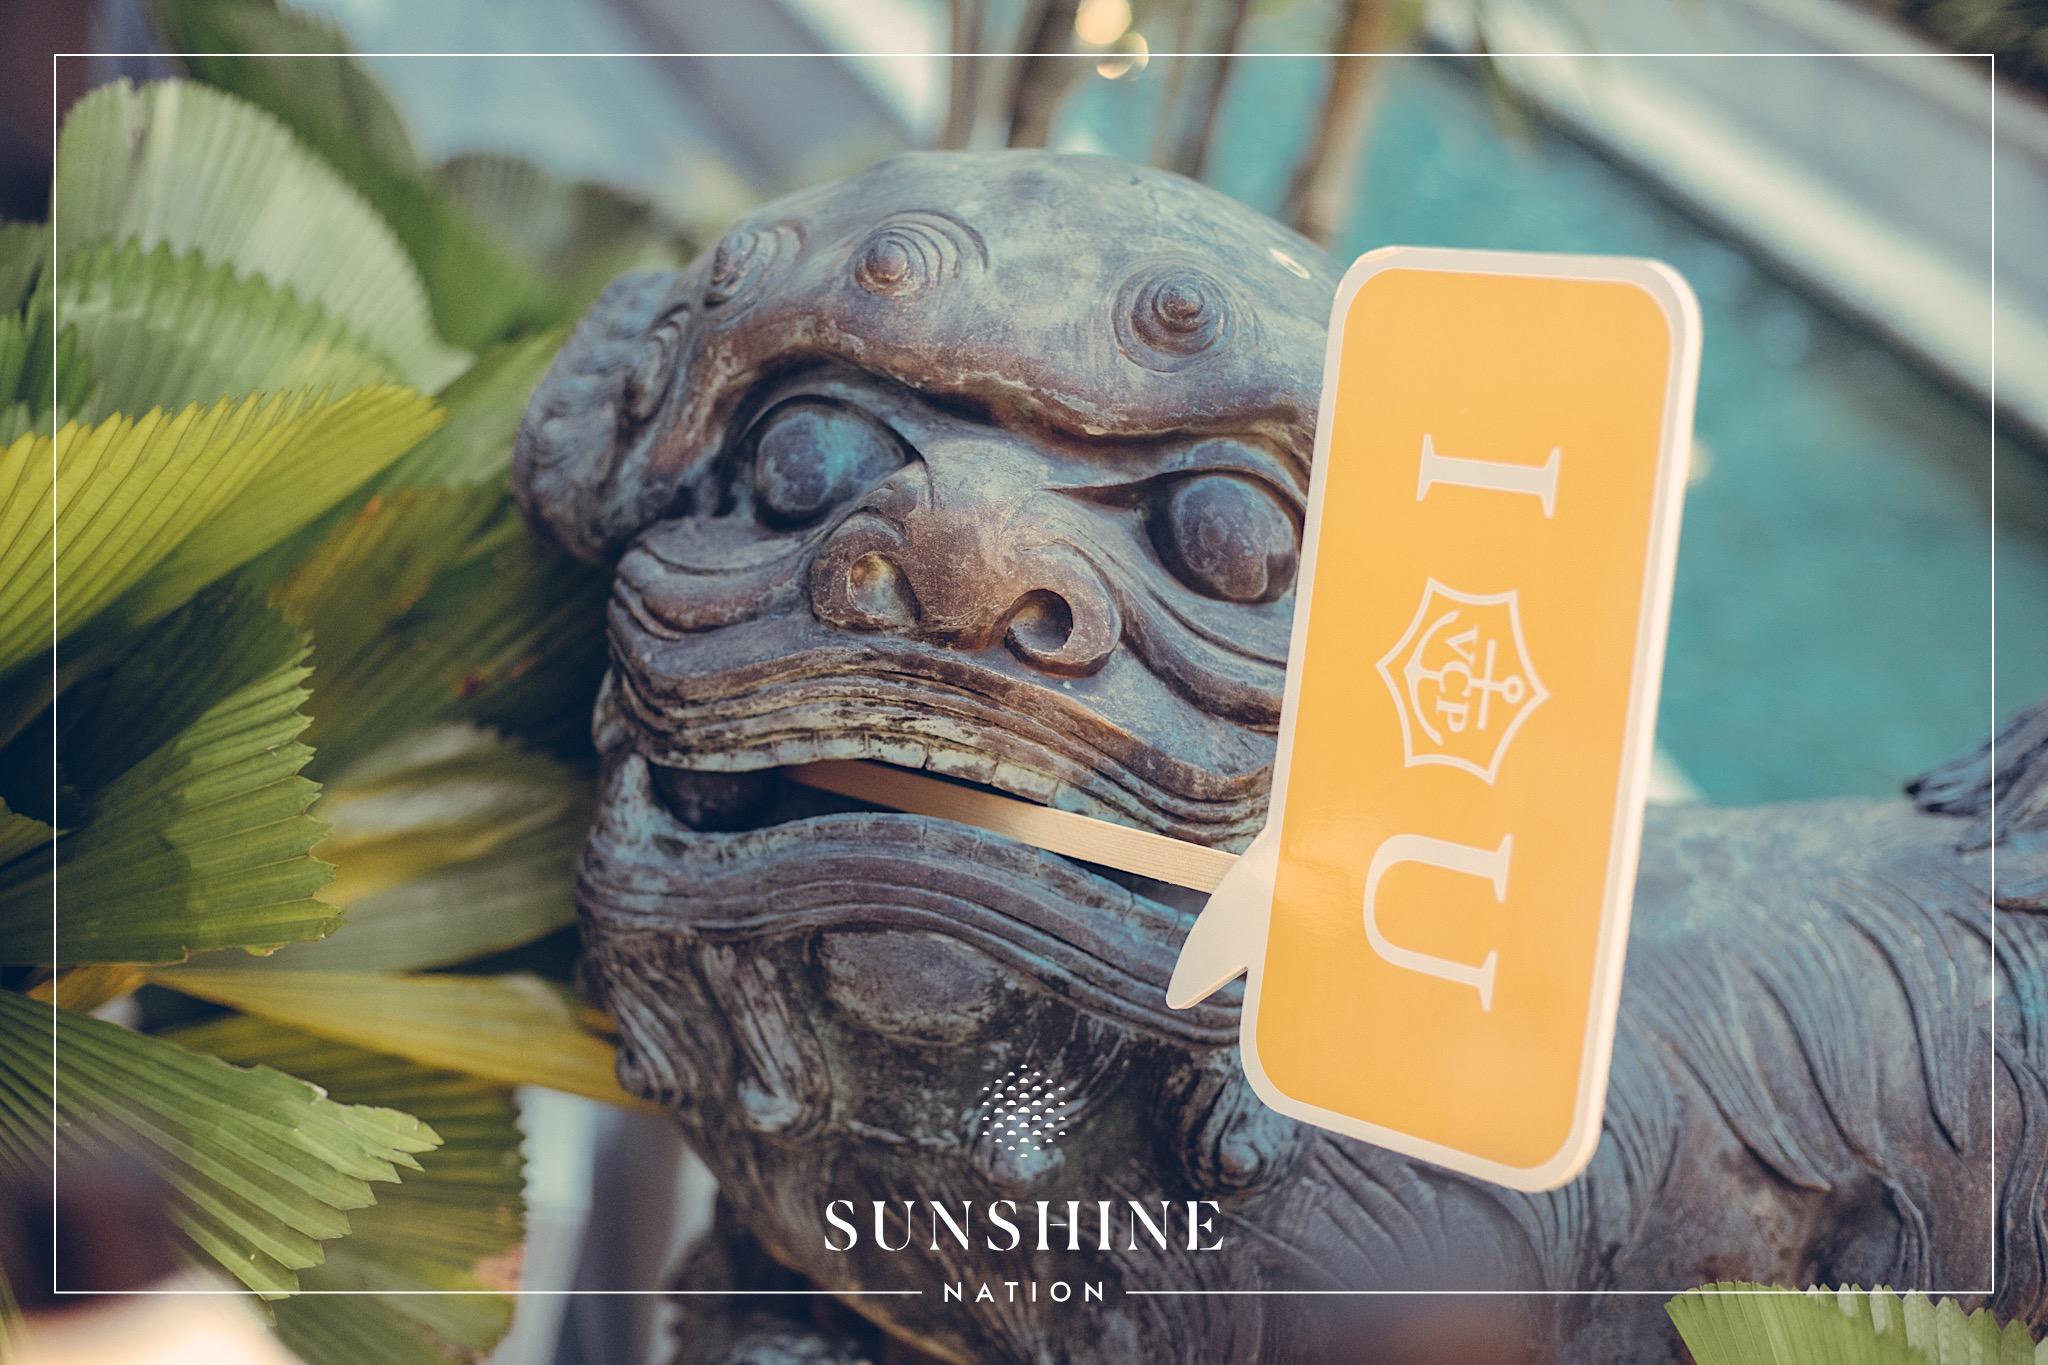 29072017_SunshineNation_Colossal033_Watermarked.jpg